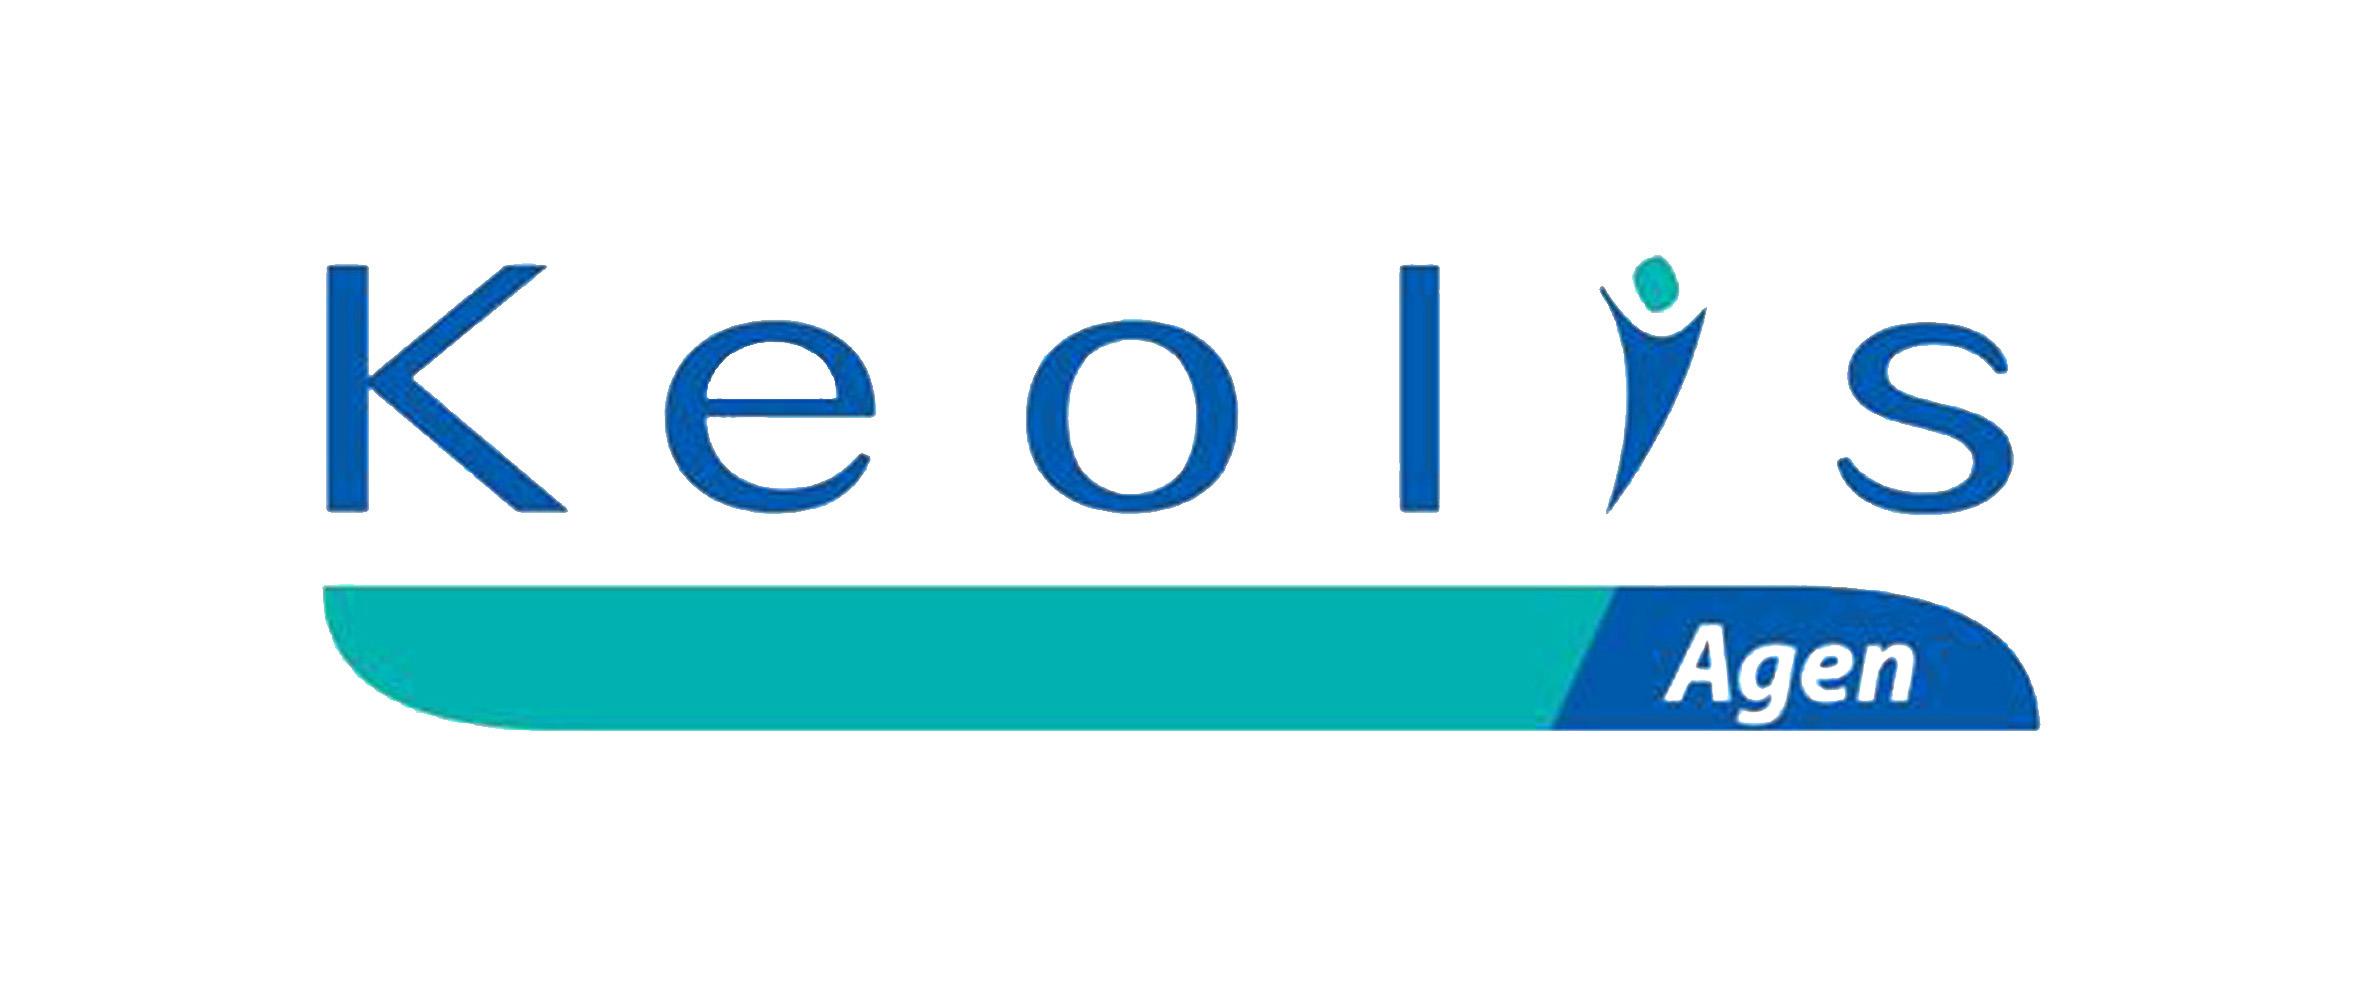 image logo keolis